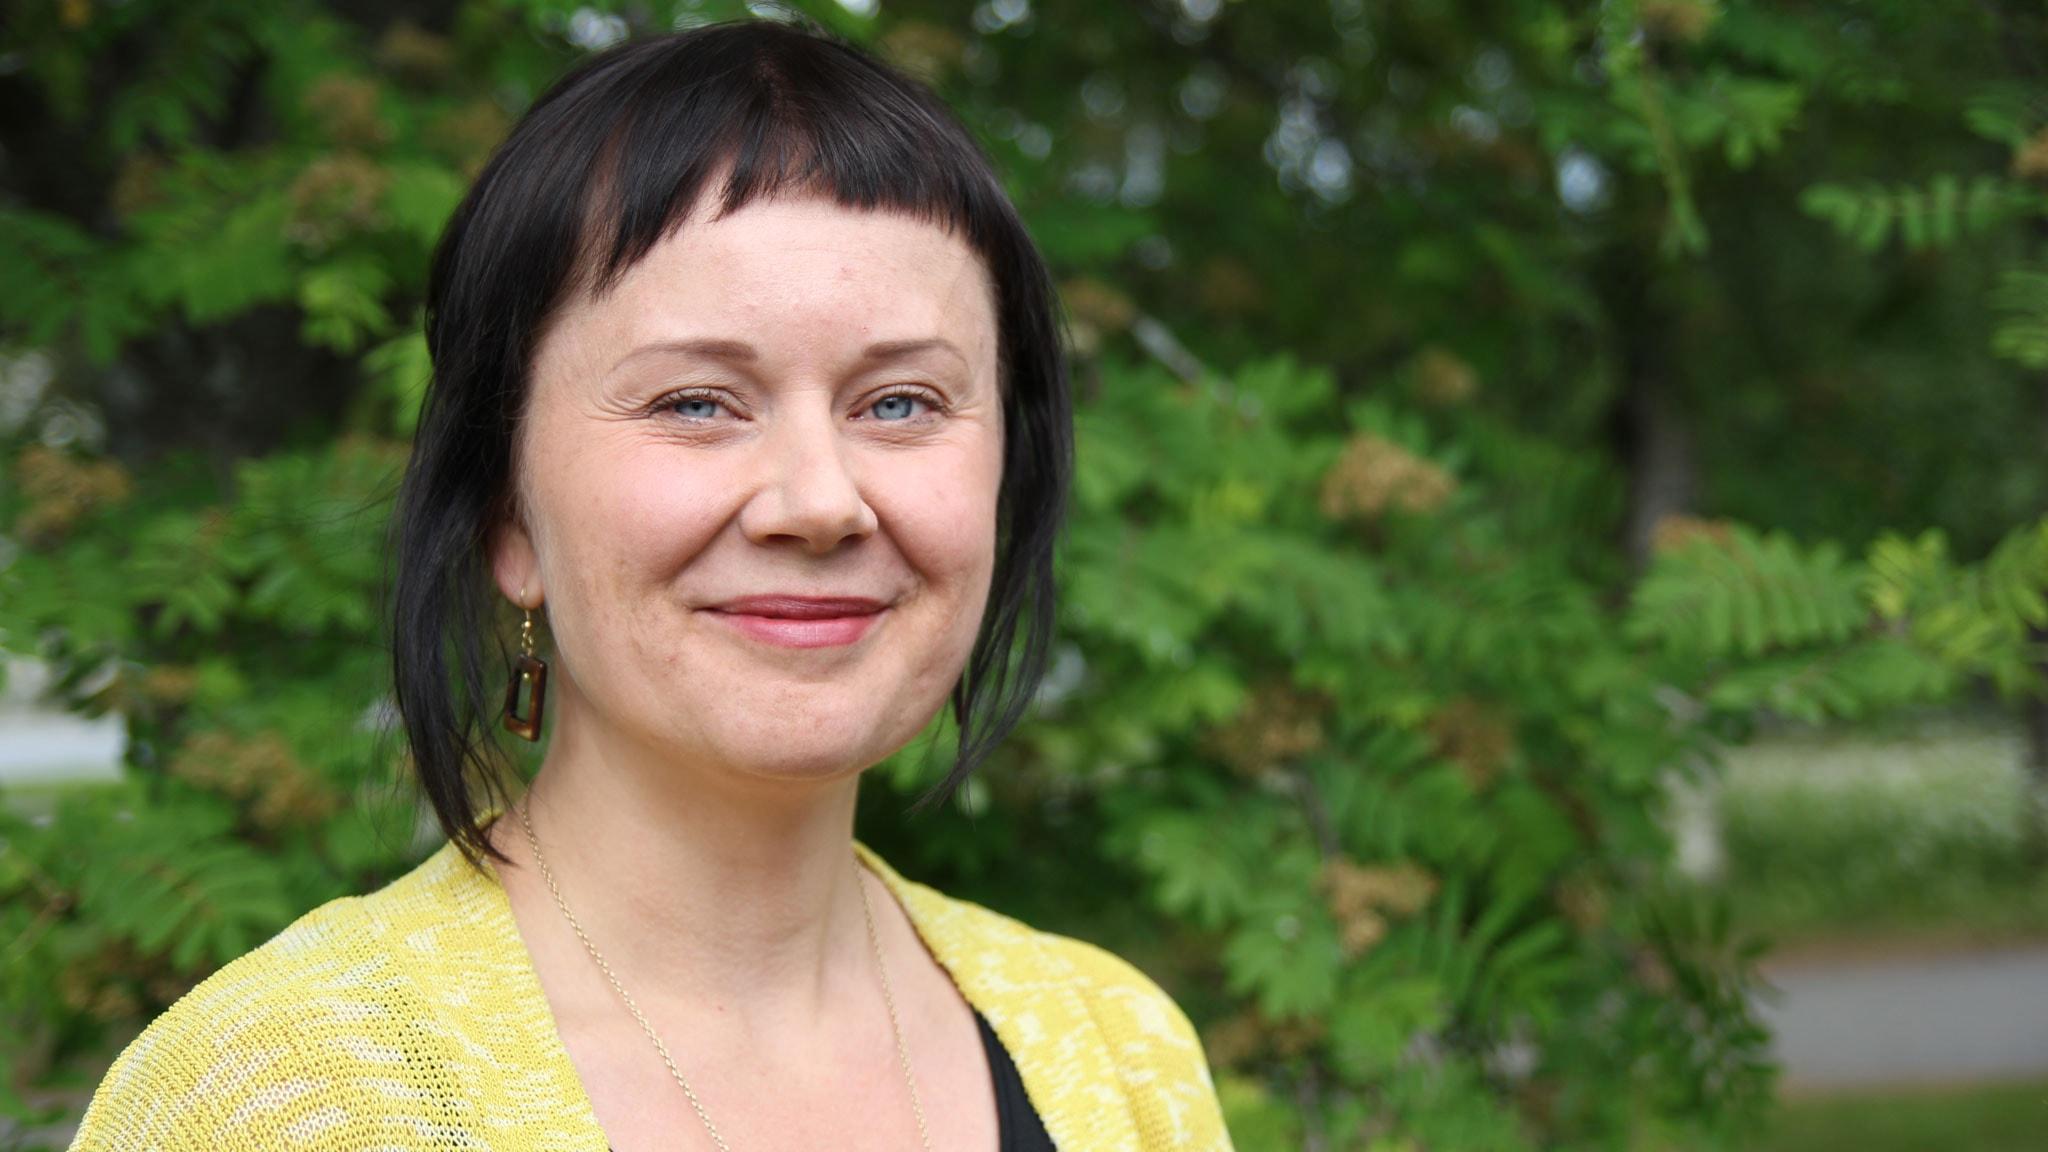 En fredag i bassängen - Susanne Dahl